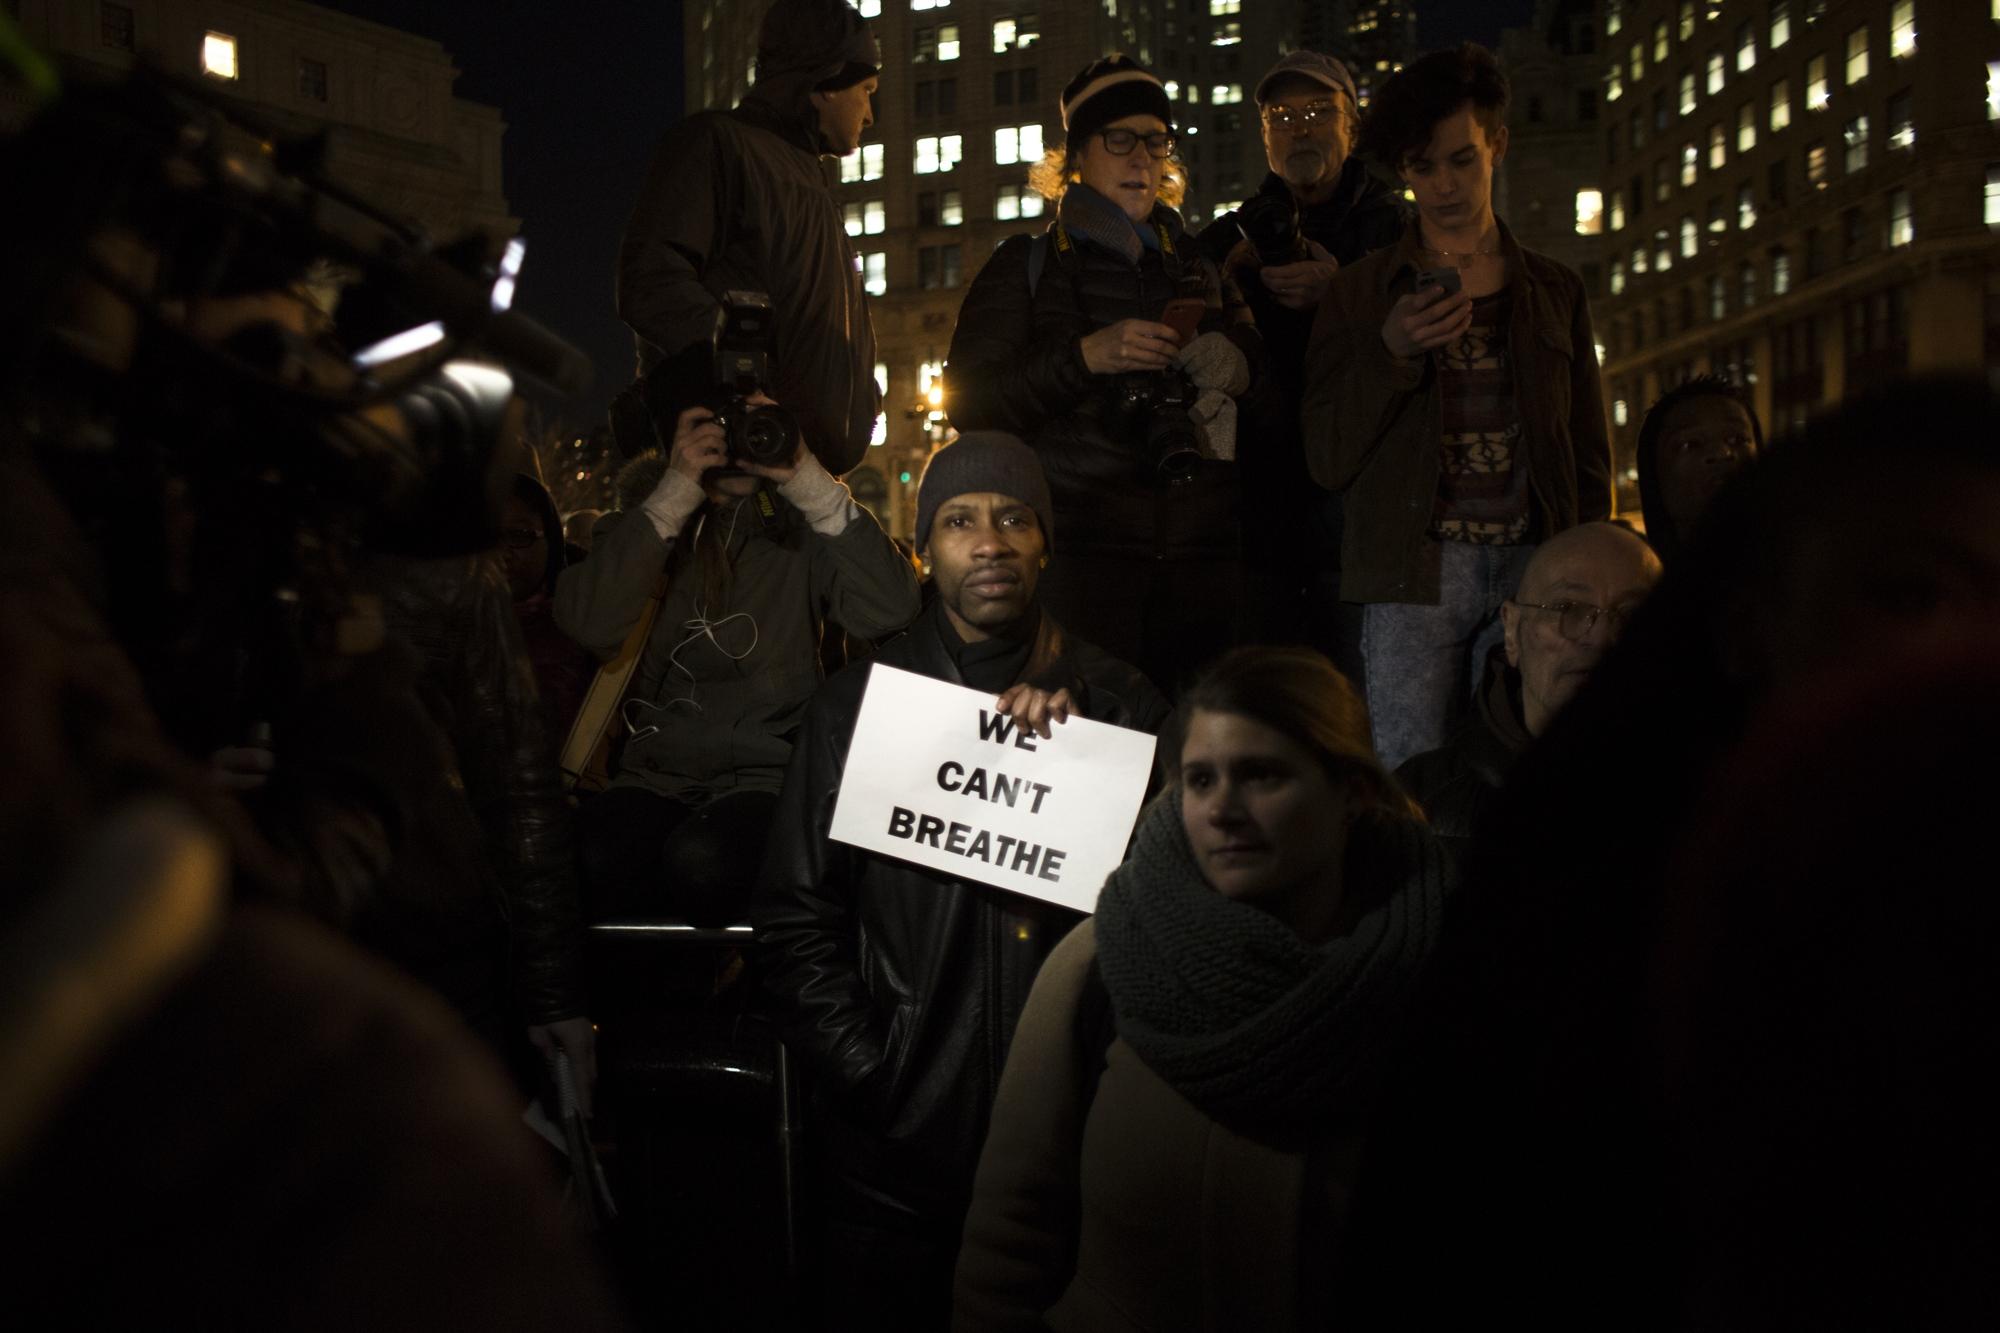 Black Lives Matter protest, New York City, Dec. 4, 2014.